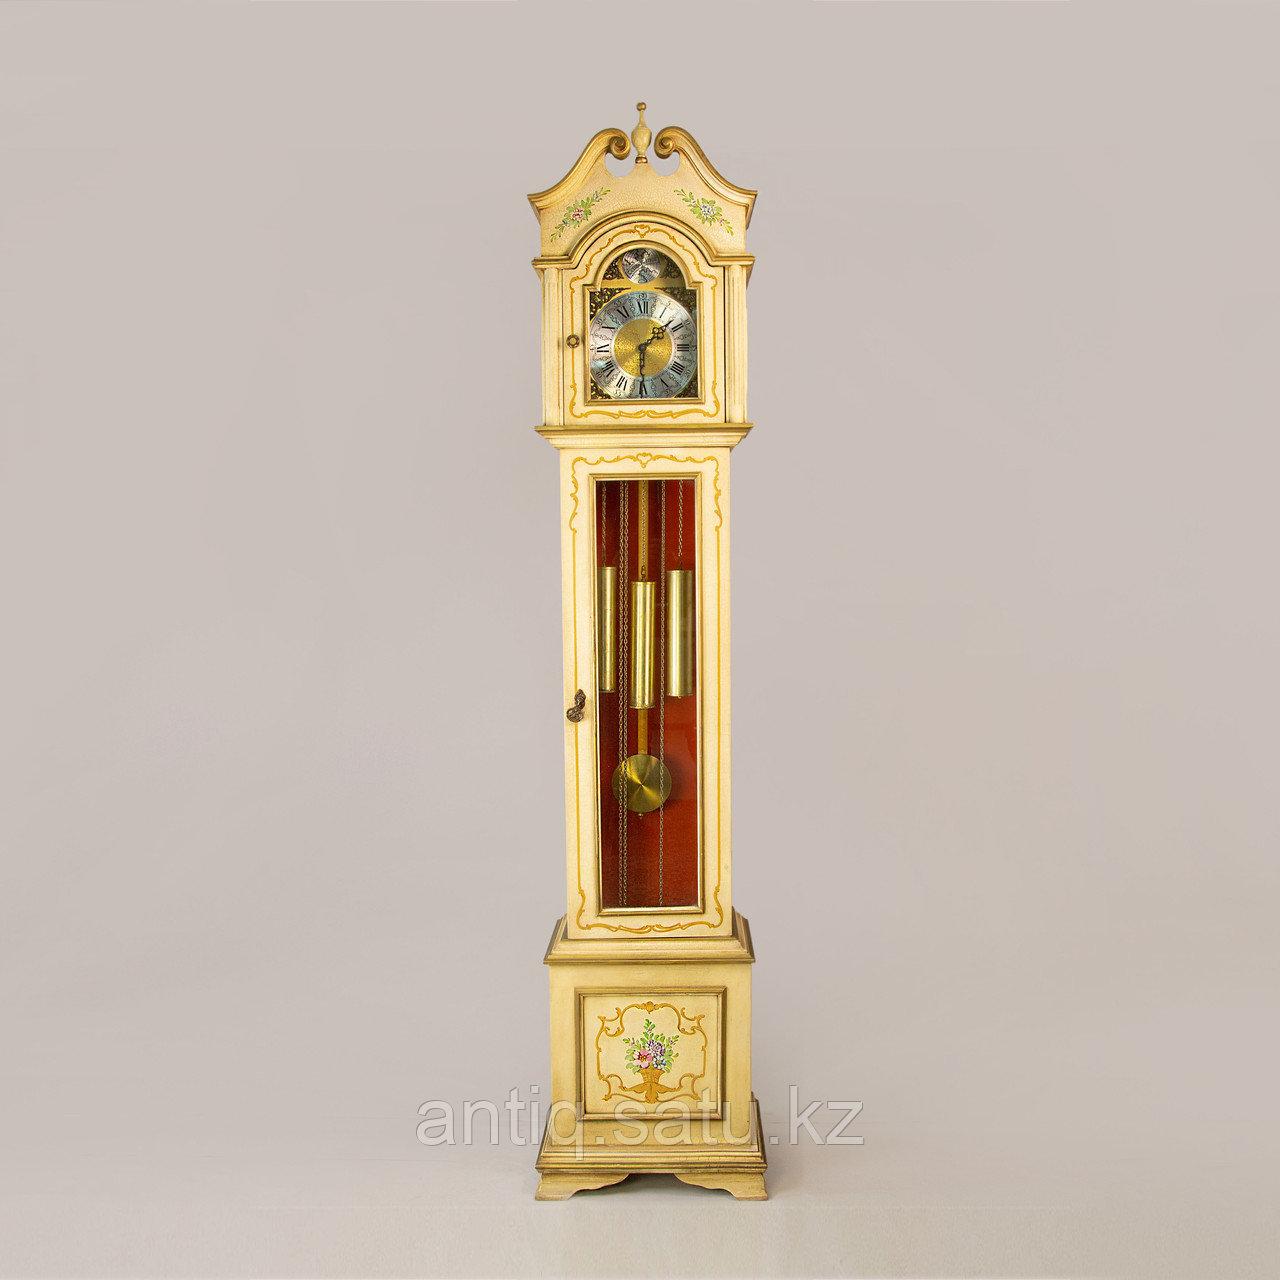 Напольные часы. Часовая мастерская Franz Hermle & Sohne. Германия. 1977 год. - фото 1